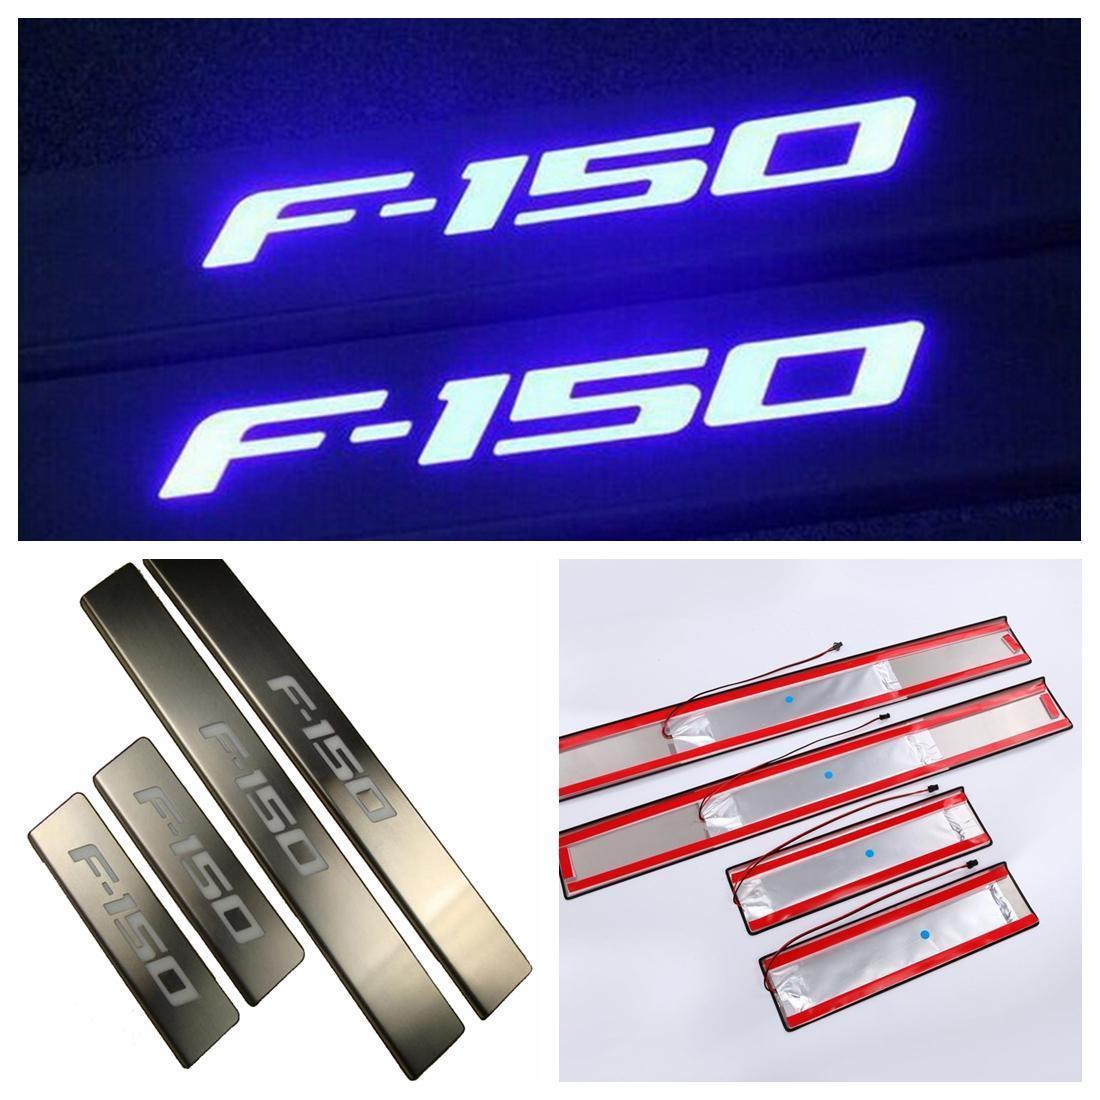 US ライトガード プロテクター フォードF150用4本のLEDライト4ドアステンレススカーフプレートドアシルエントリーガード 4Pcs LED Light 4 Door Stainless Scuff Plate Door Sill Entry Guard For Ford F150